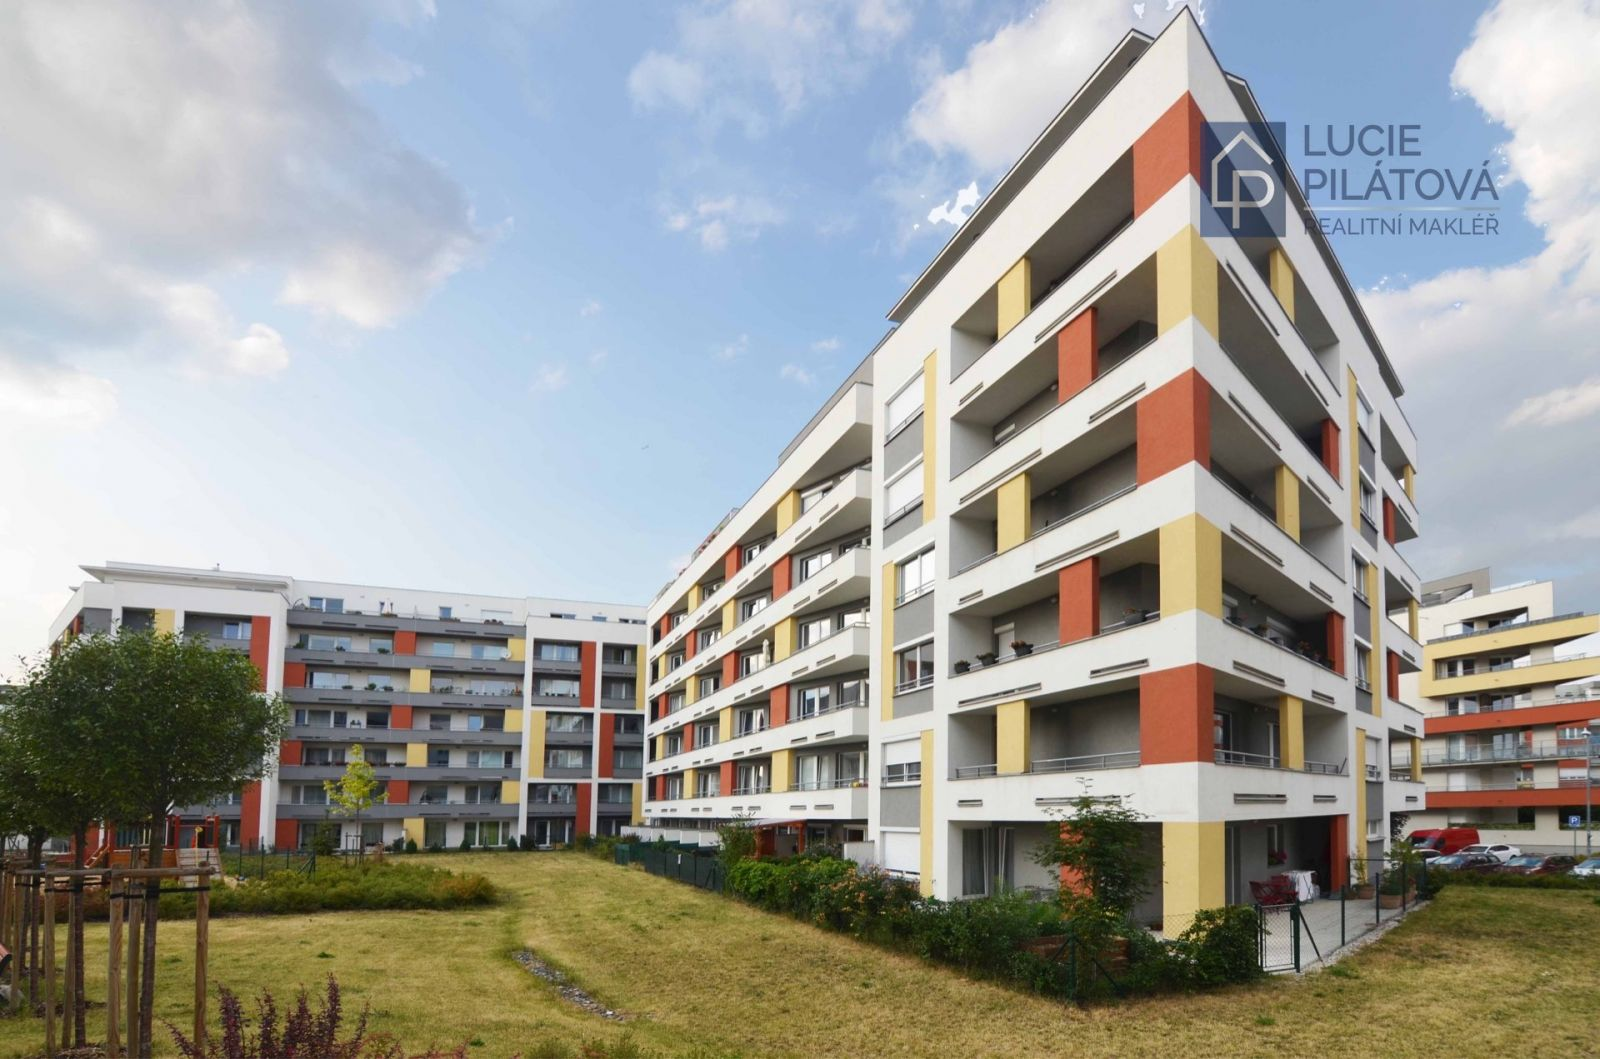 Prodej bytu 2+kk, 71 m2 s garážovým stáním - Praha - Zličín